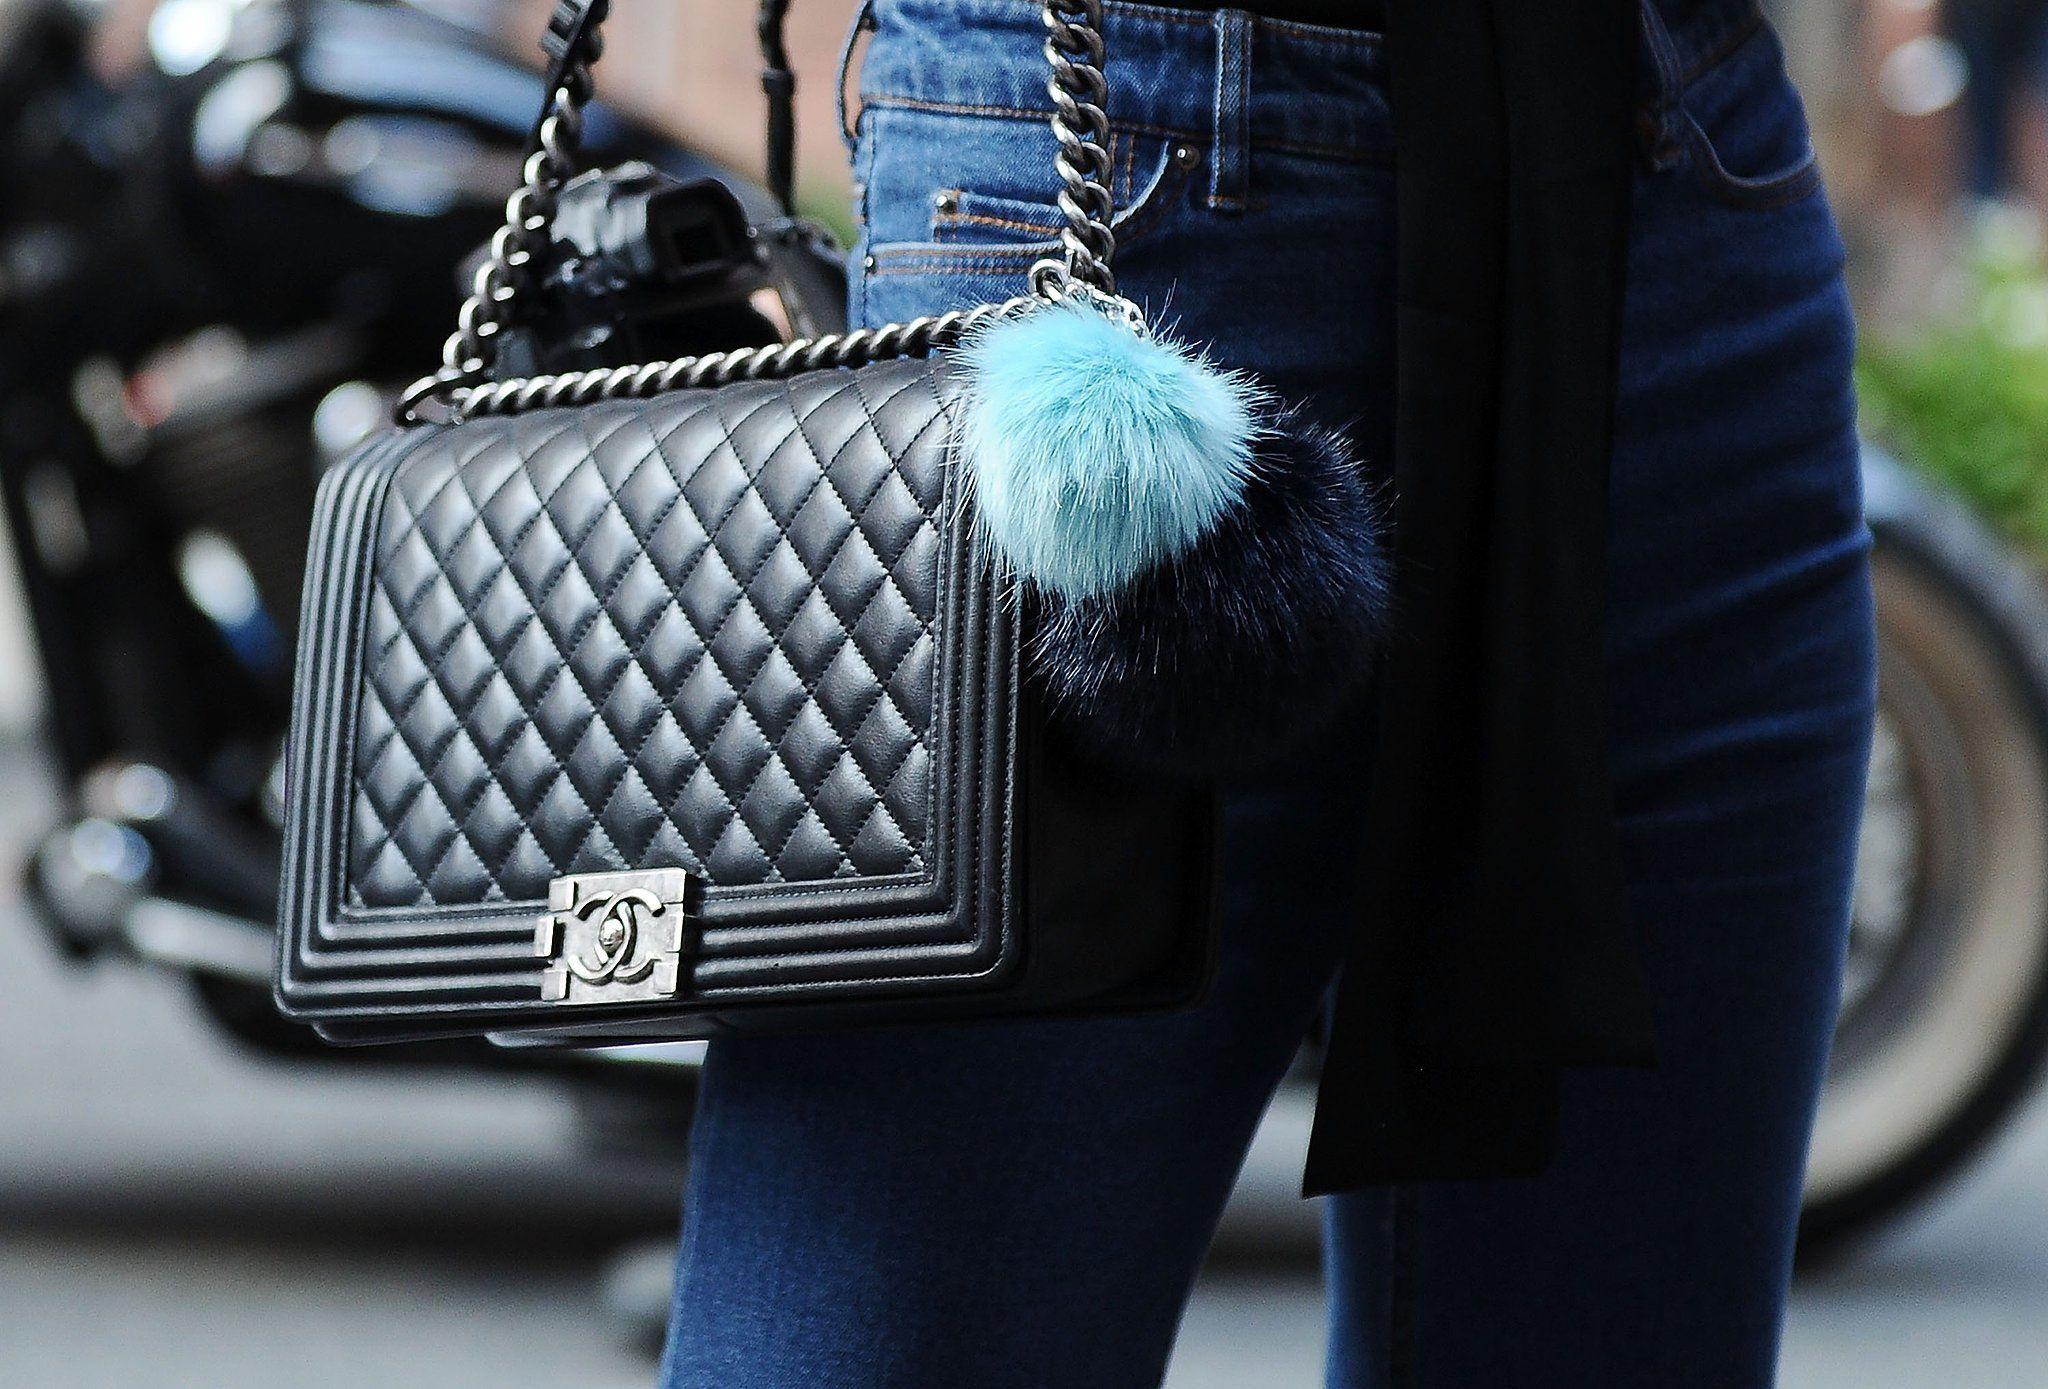 Chanel bag and Fendi keychain.